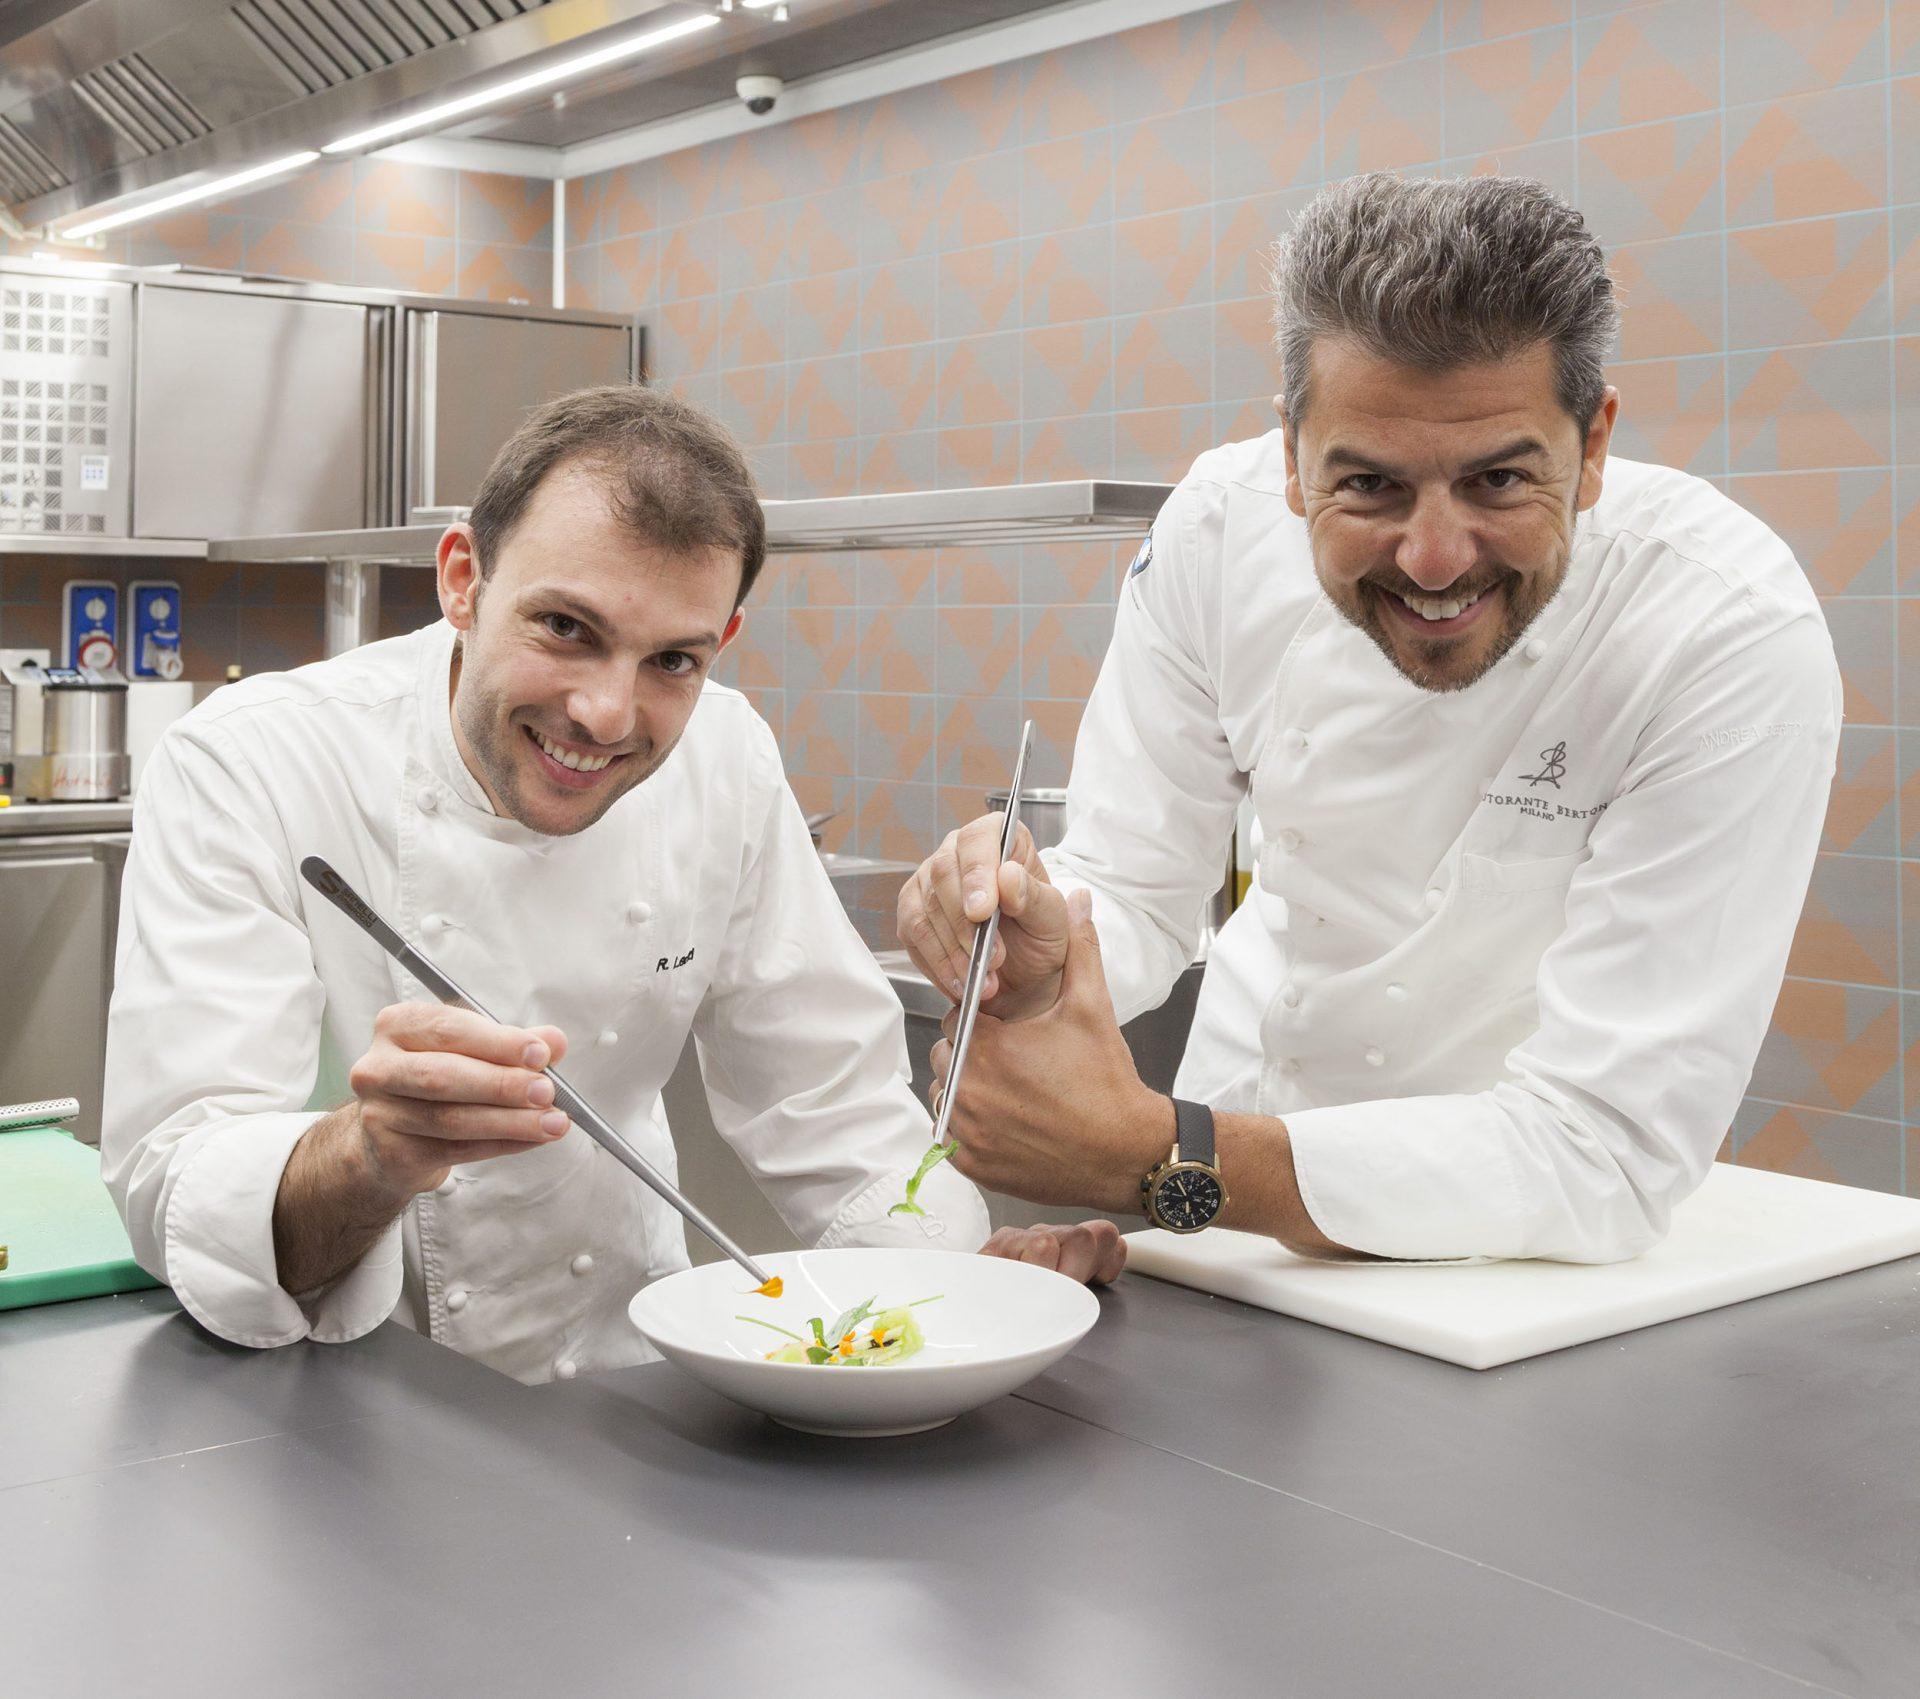 Restaurante Berton Al Lago gana su primera estrella Michelin